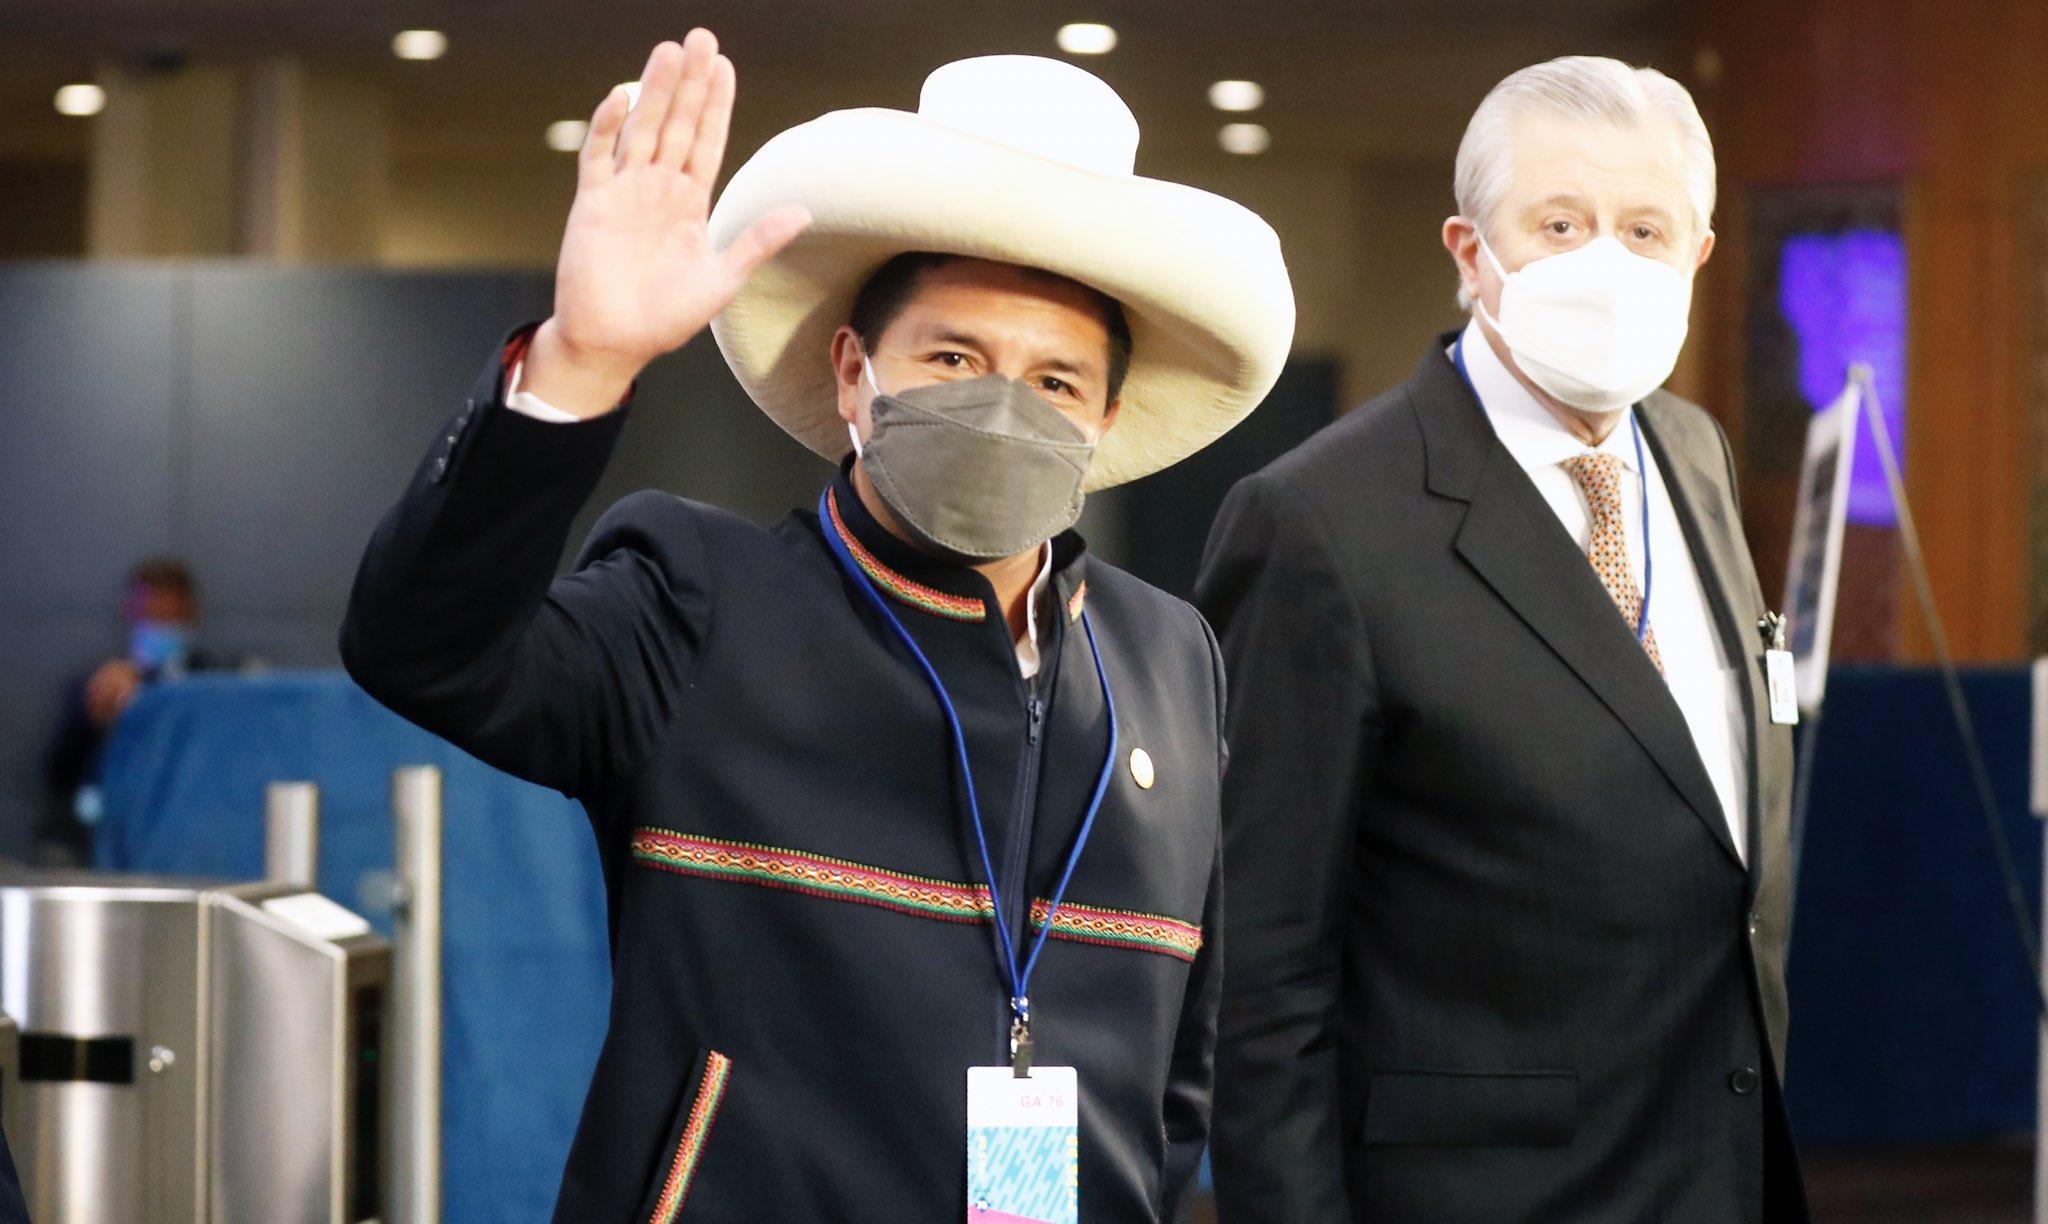 Castillo arrived at the UN headquarters in New York